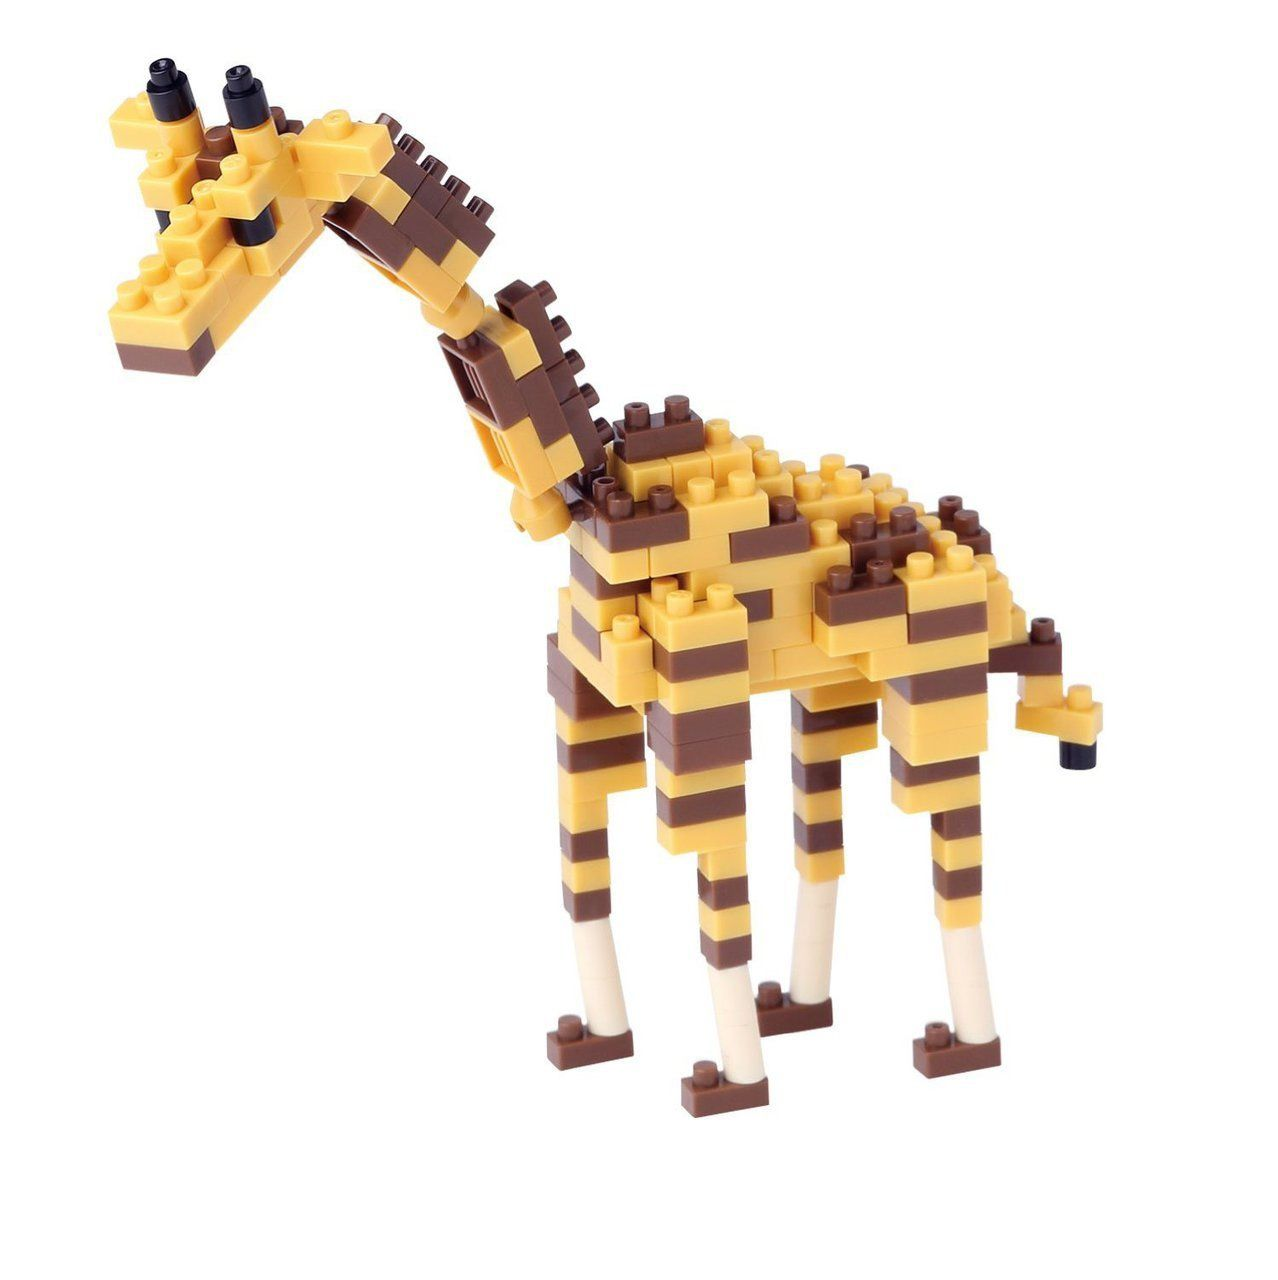 NANOBLOCK Giraffe - Construction Block Set NBC-158